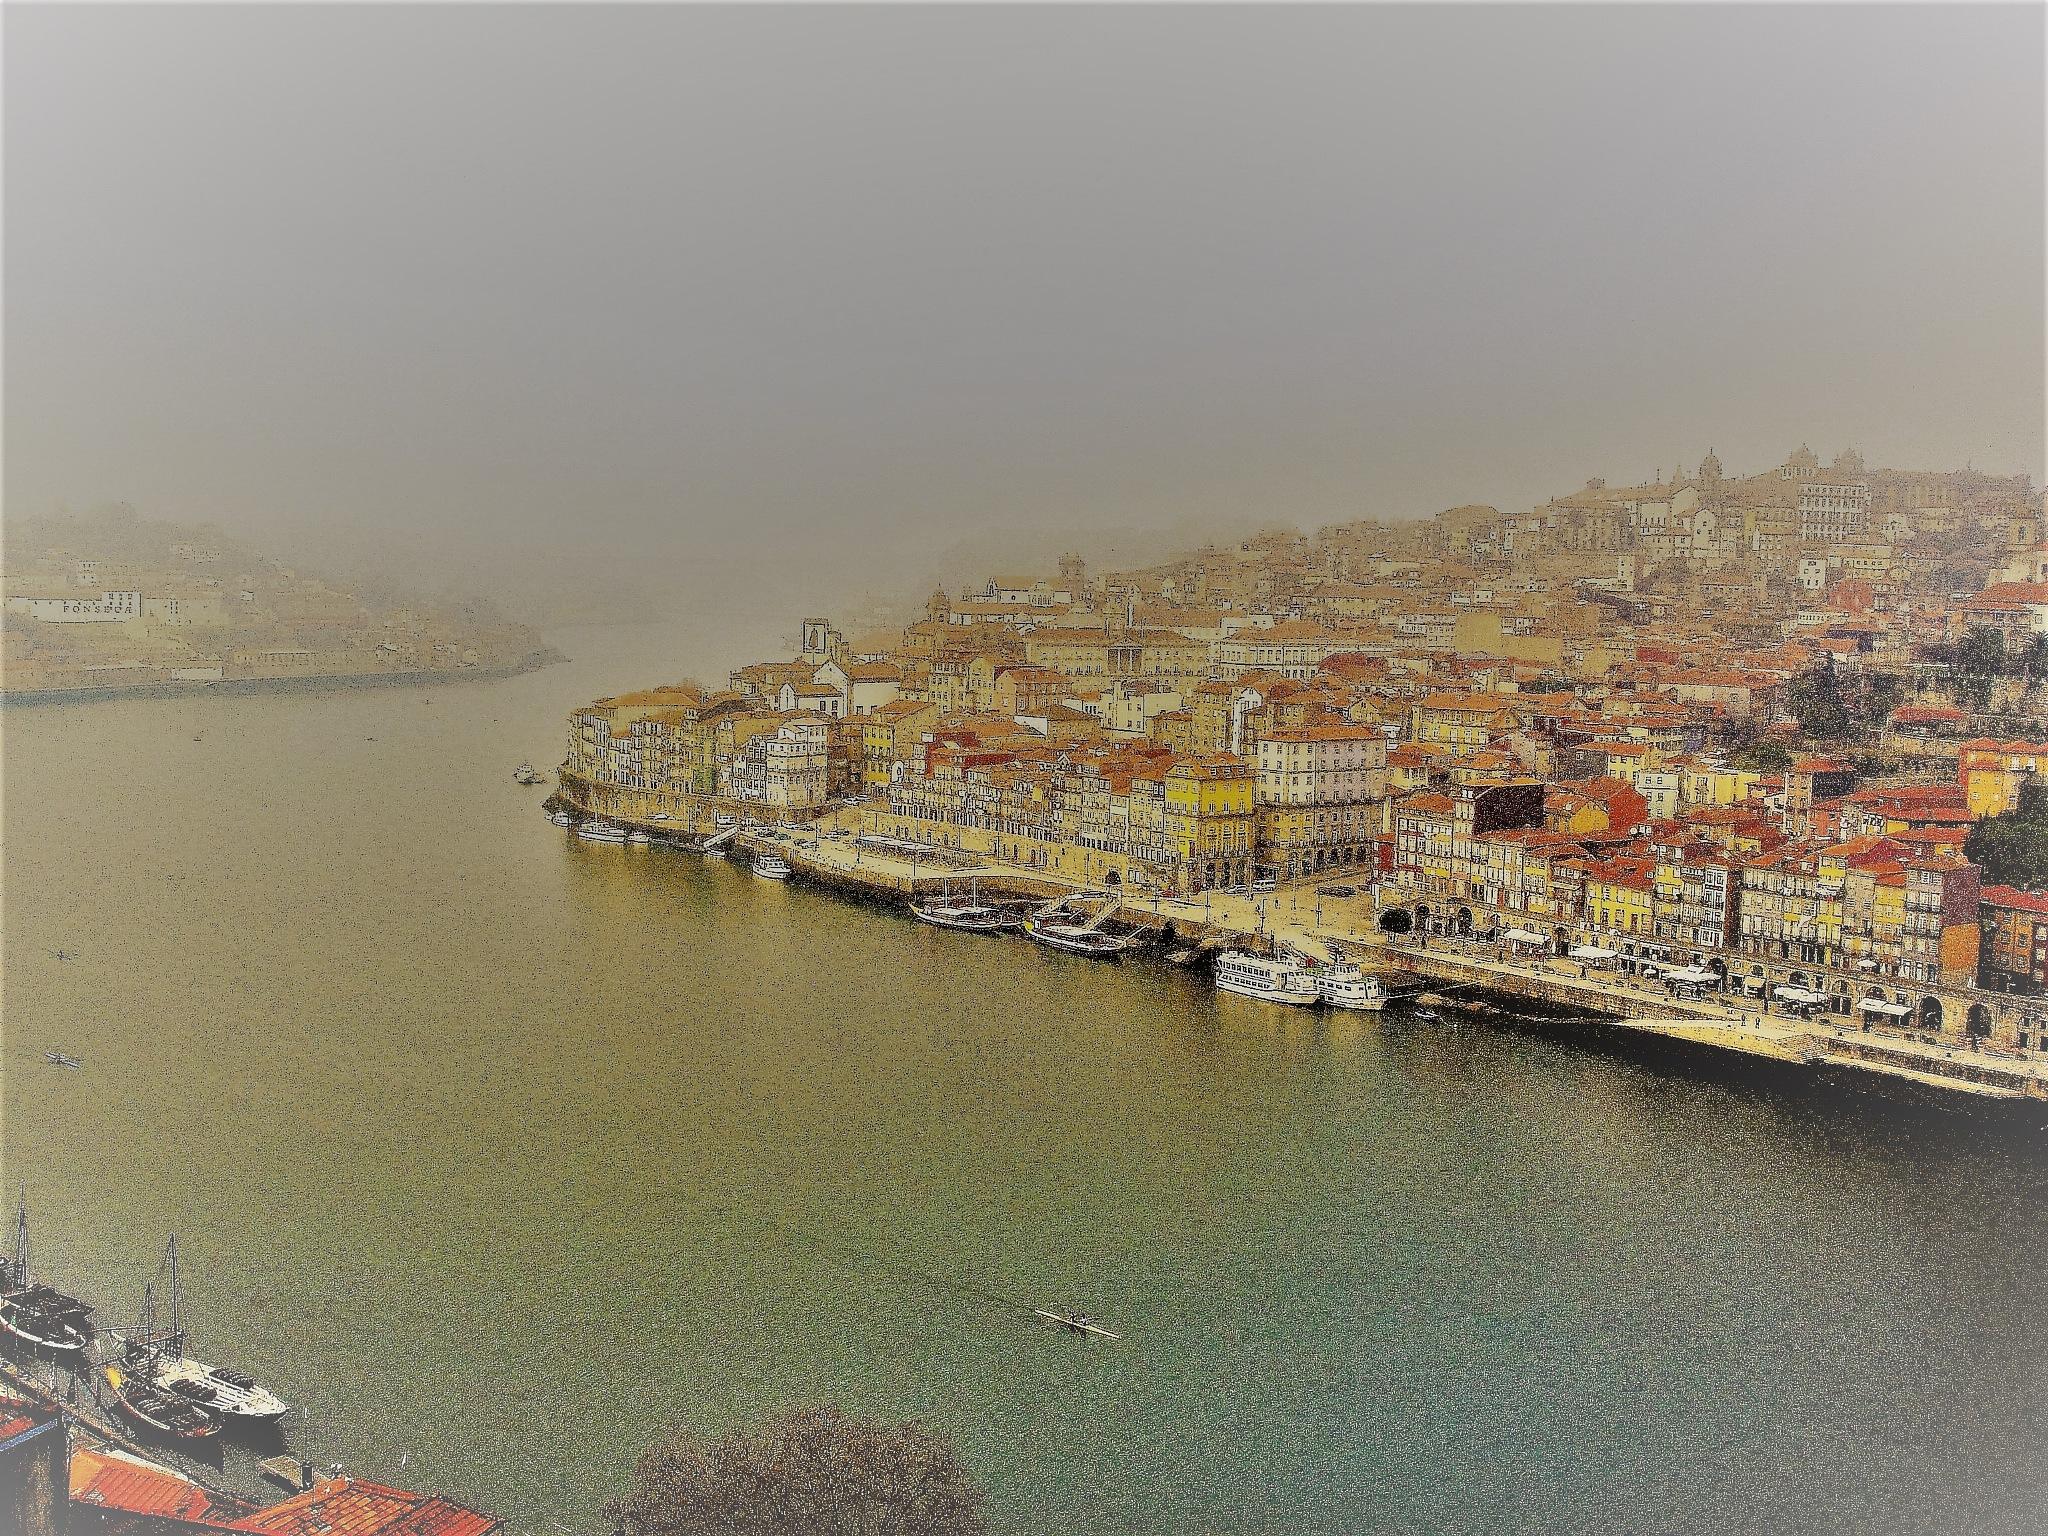 Porto by Antonio Martins